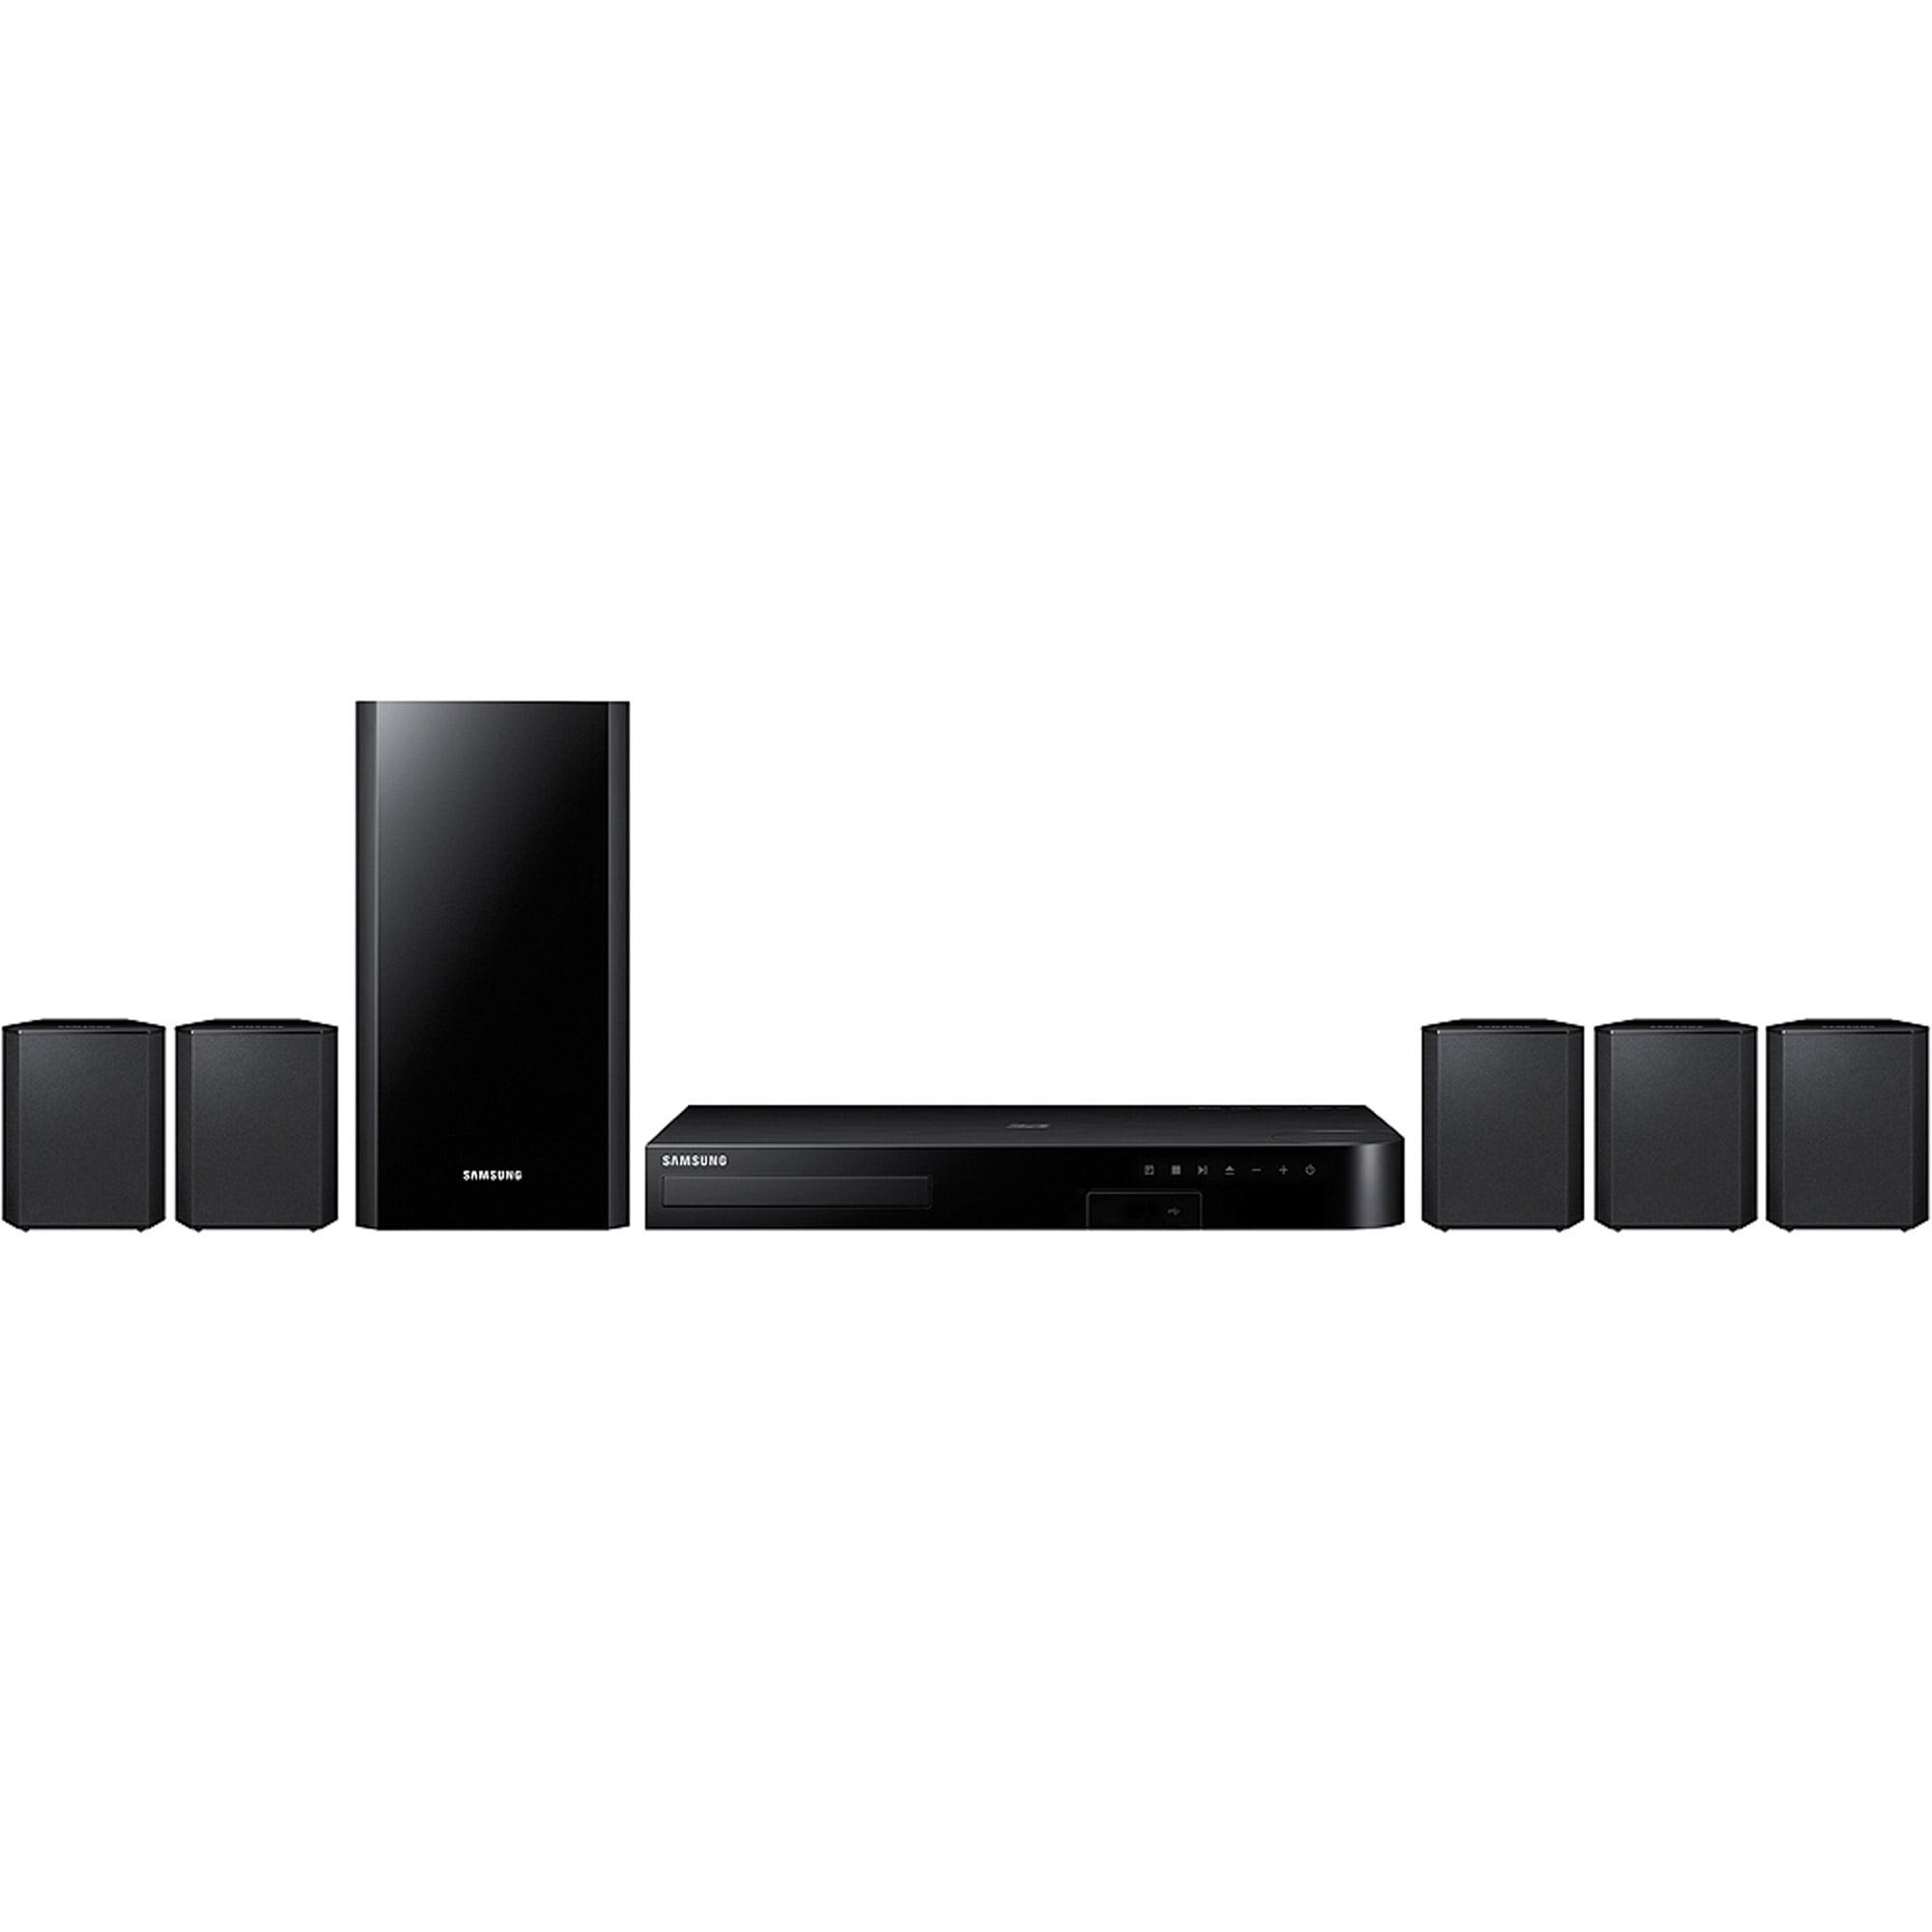 Samsung Home Theater System 5.1ch 500W (HT-J4500/ZA)